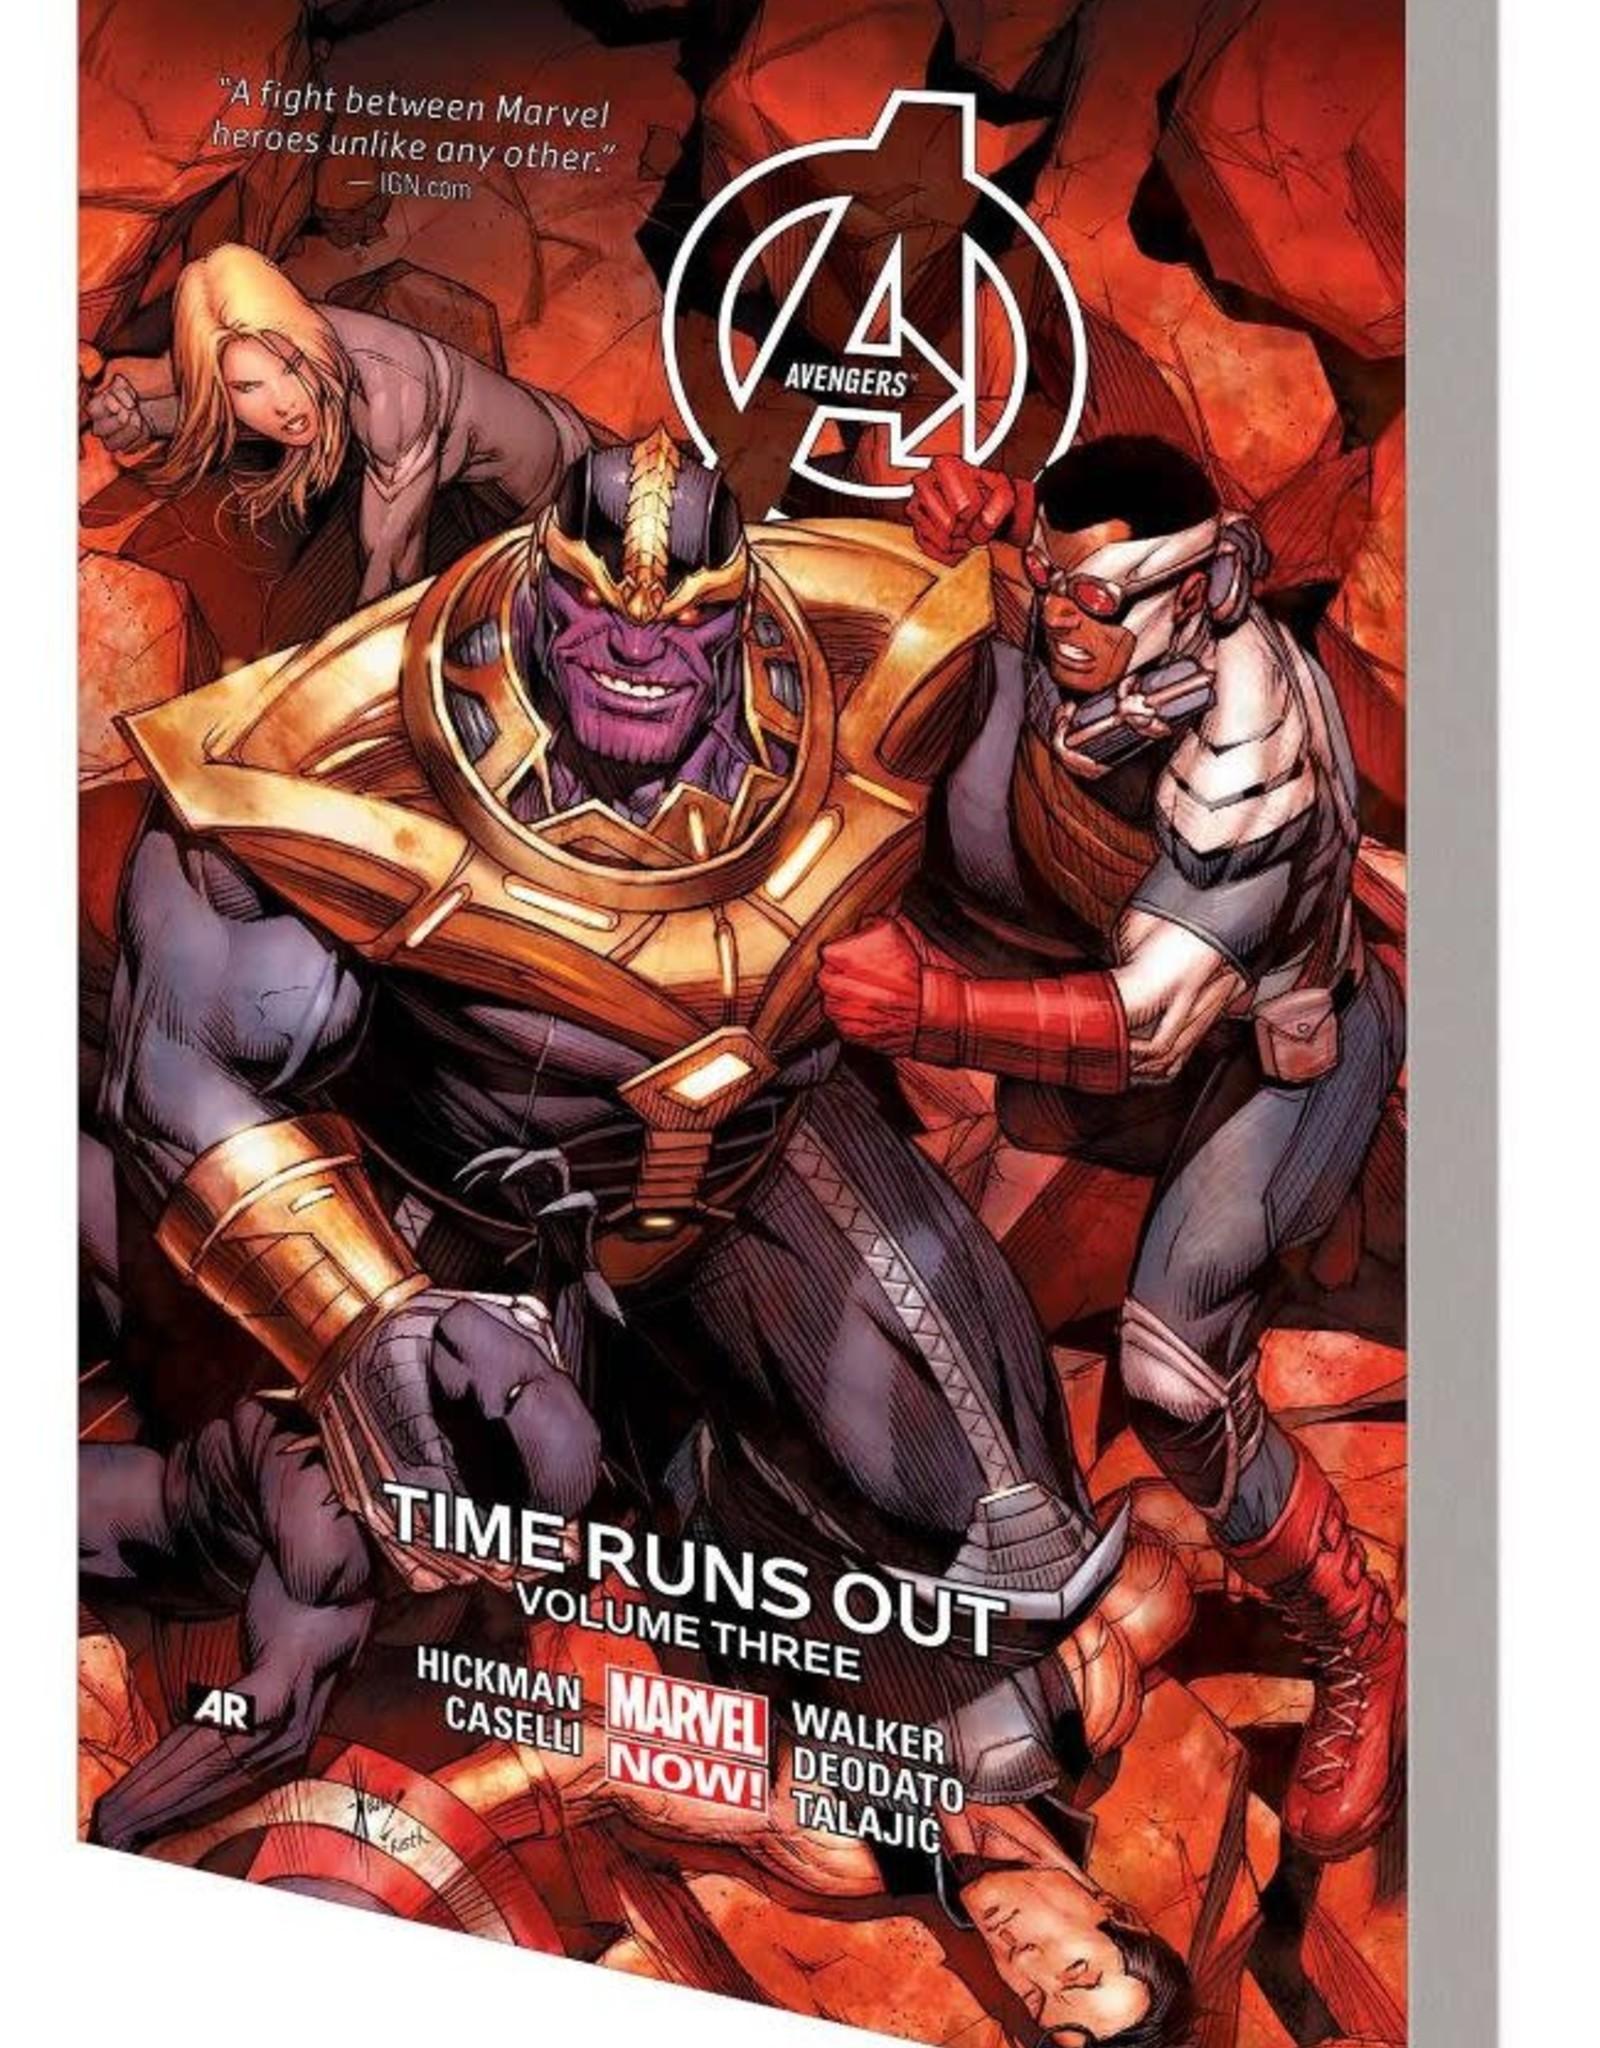 Marvel Comics Avengers Time Runs Out Vol 03 TP